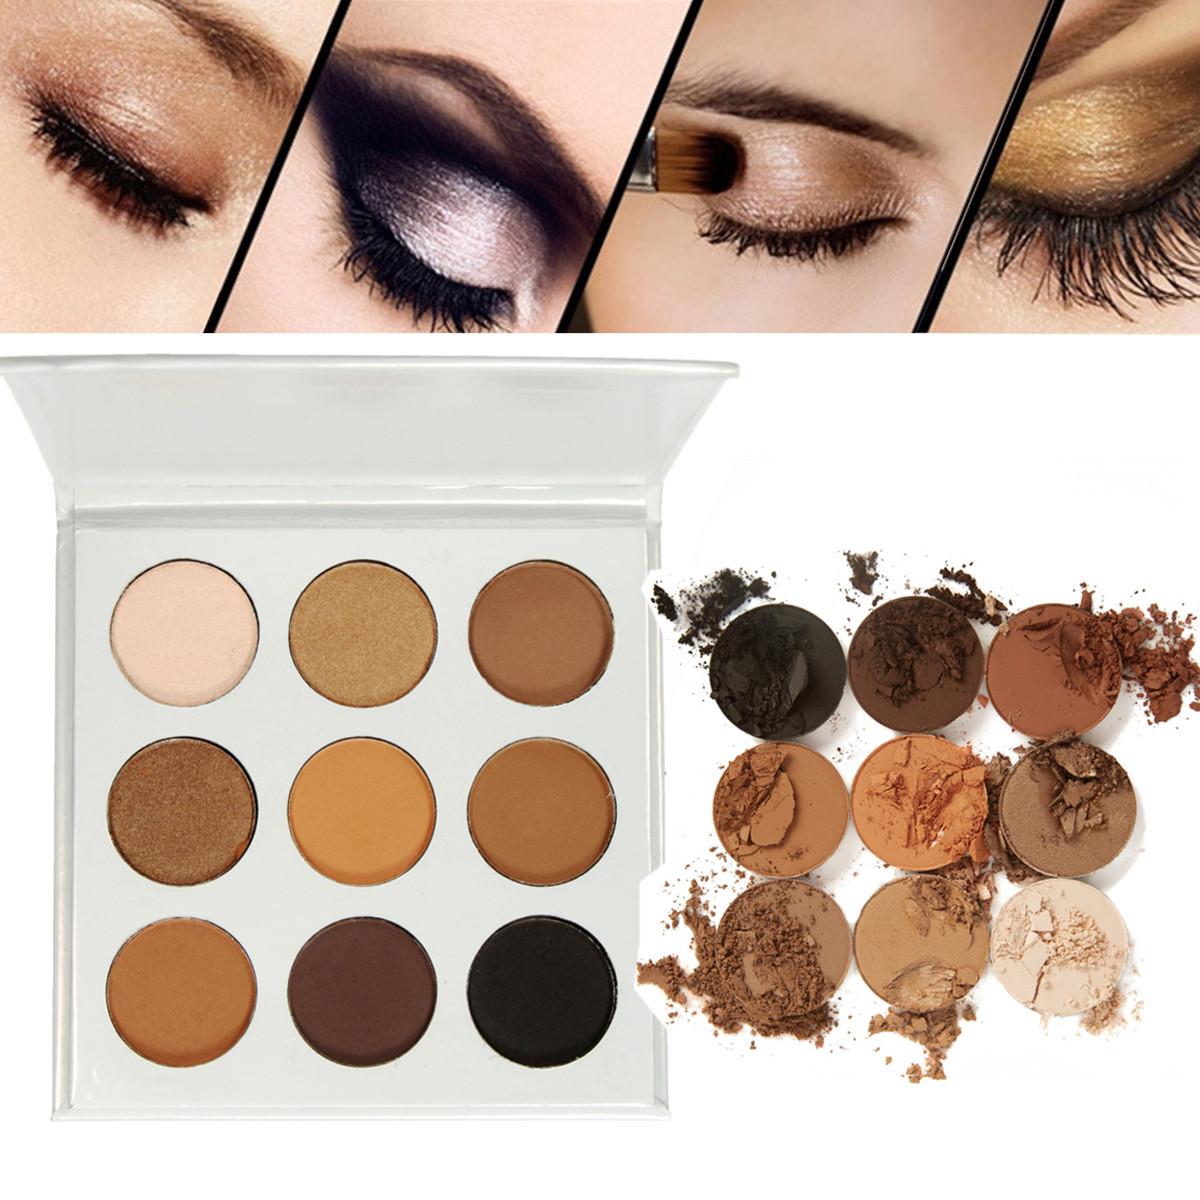 9 Colors Earth Eye Shadow Makeup Palette Set Cosmetic Shimmer Matte Eyeshadow